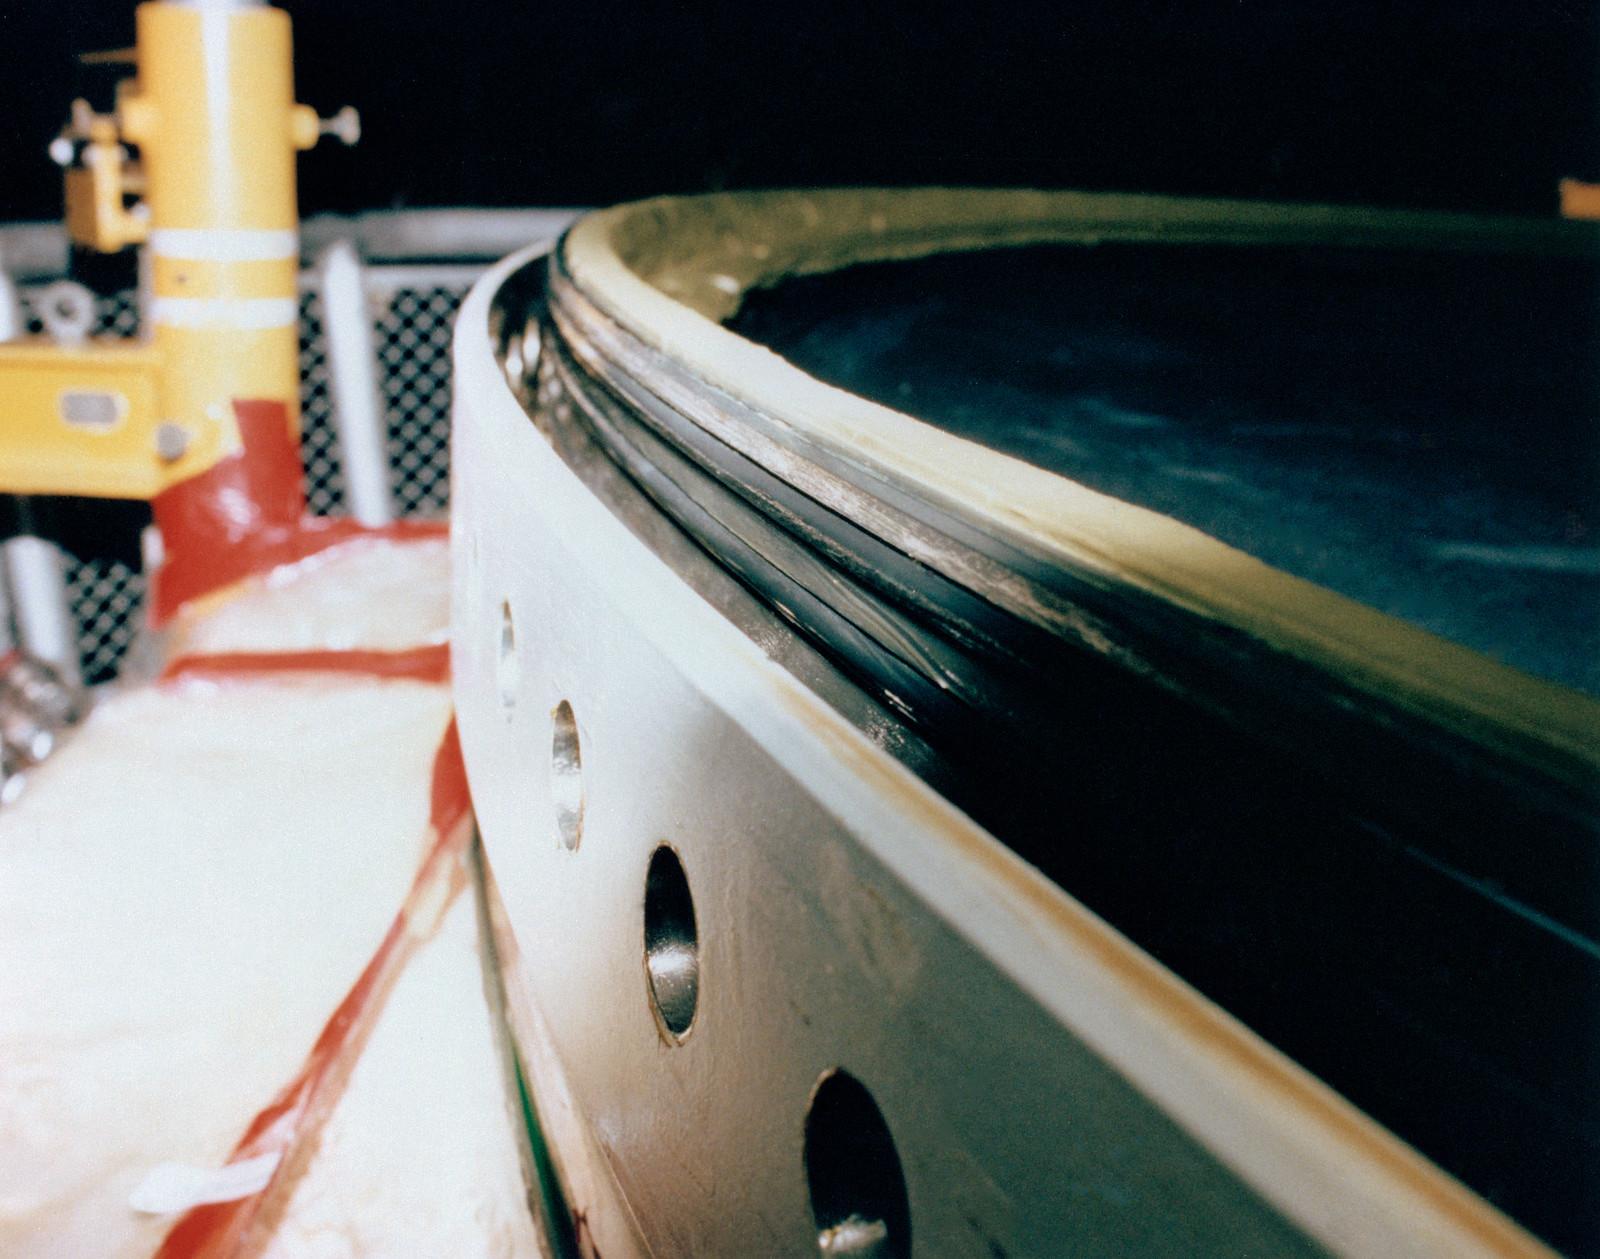 space shuttle challenger last transmission - photo #33